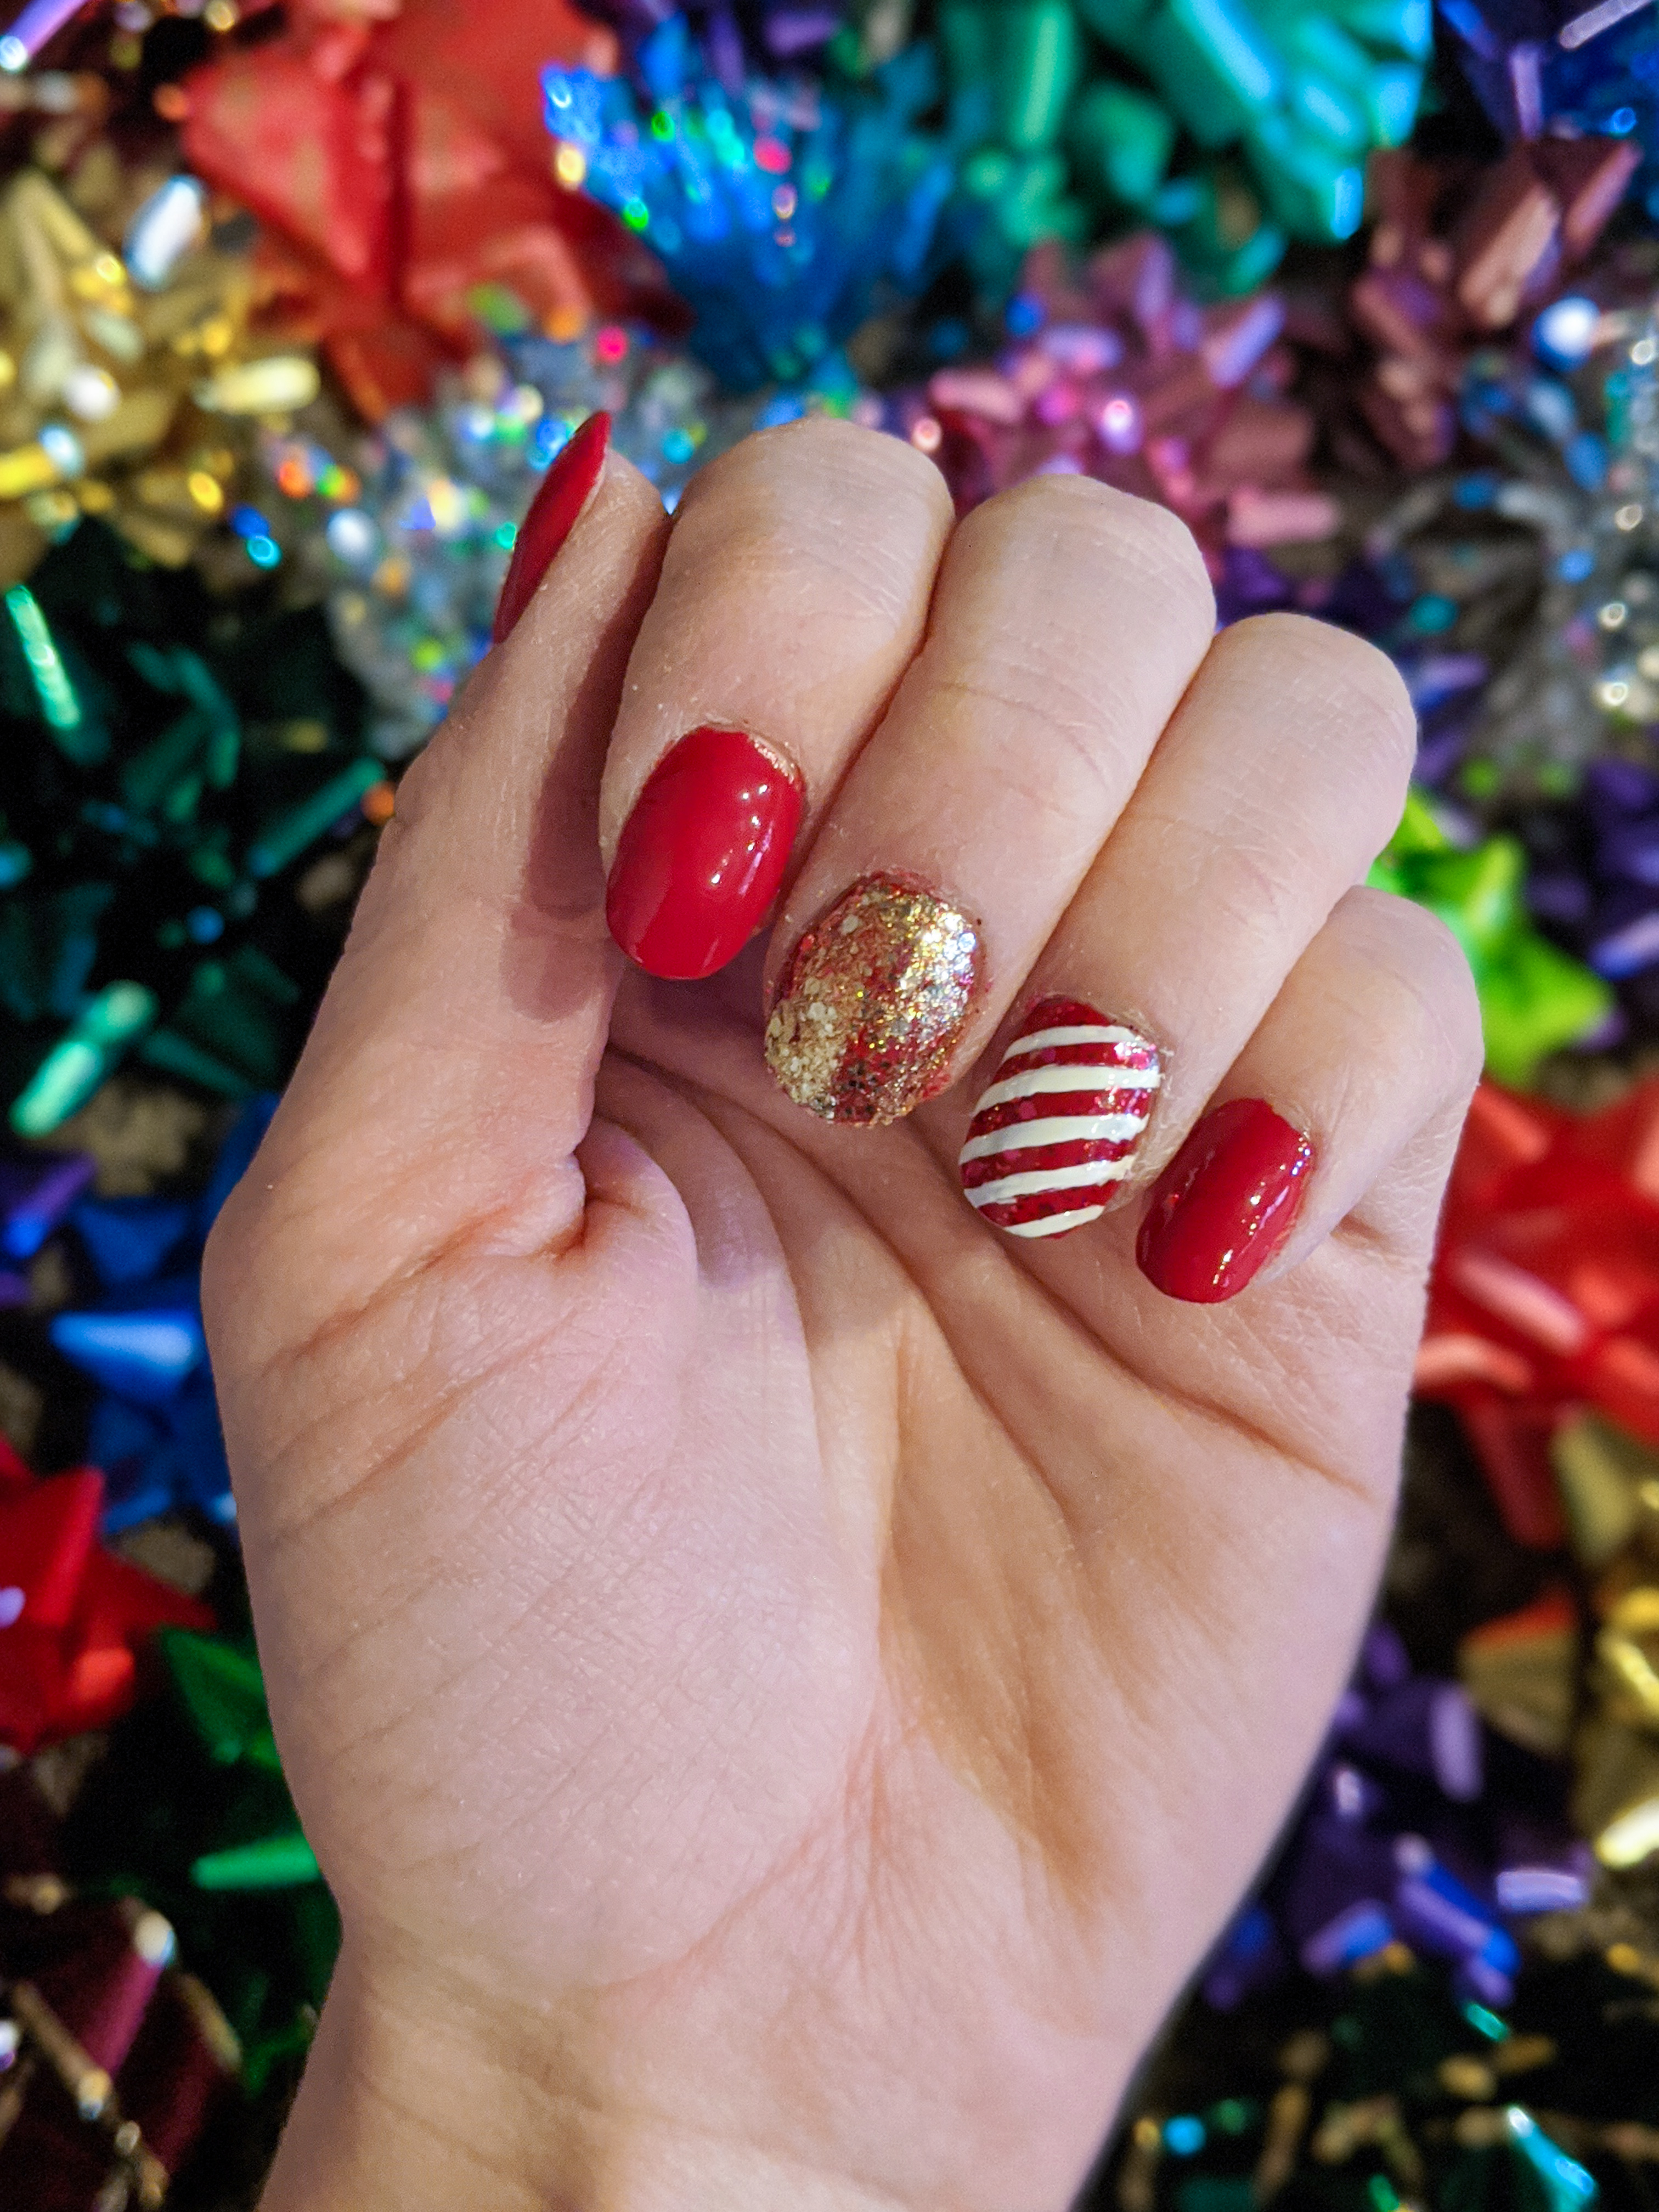 candy cane nails, winter nails, glam Christmas nails